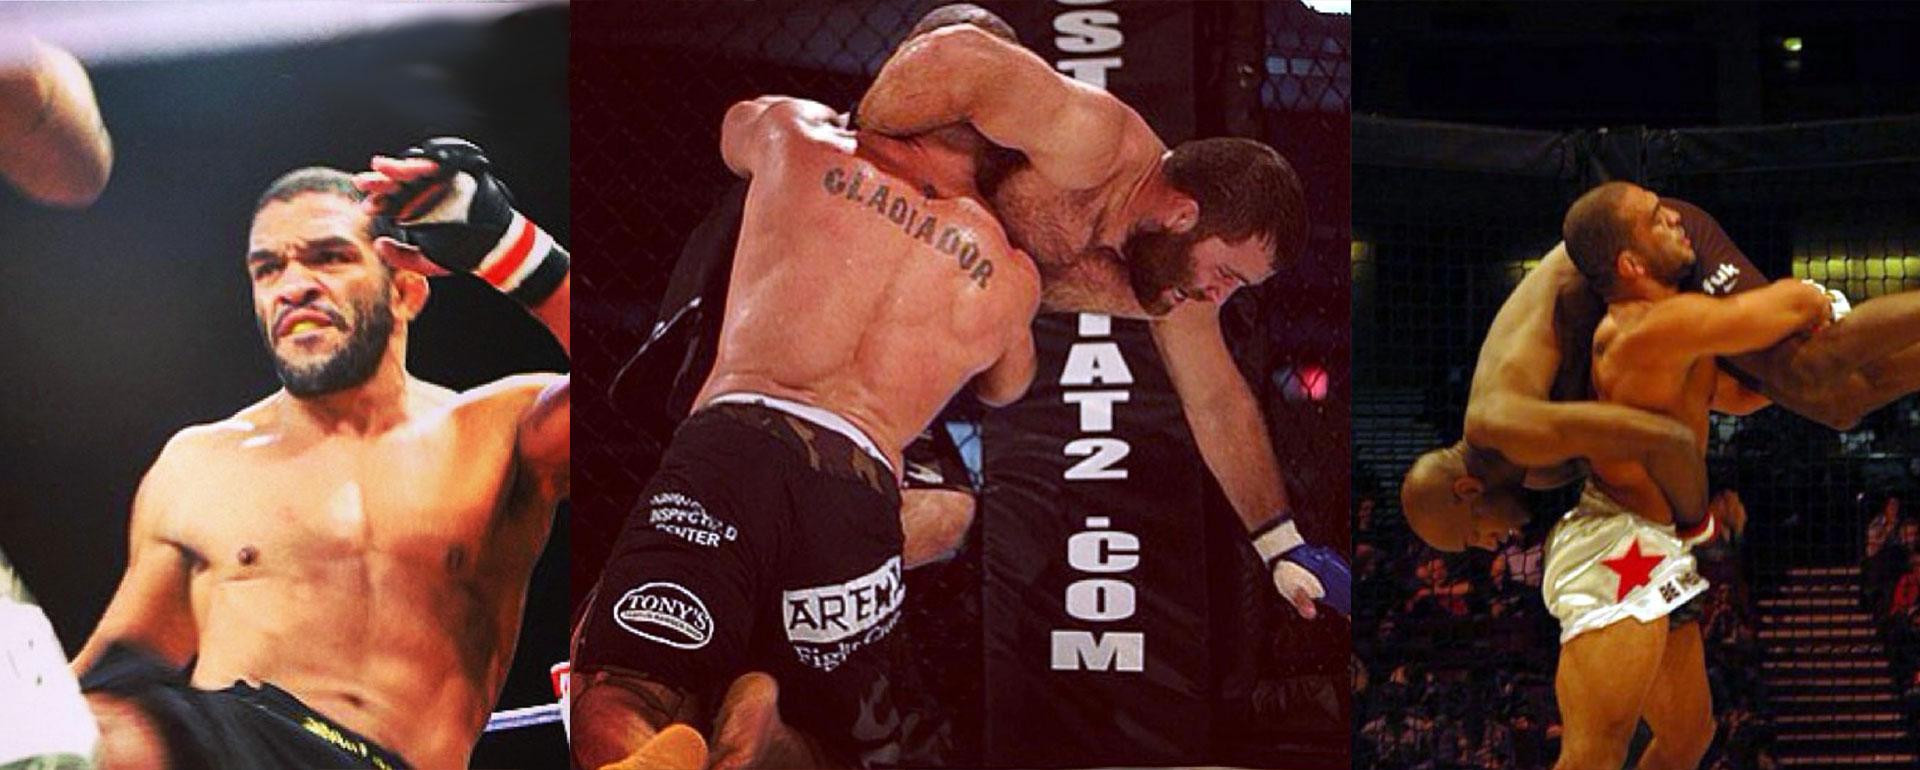 MMA Program